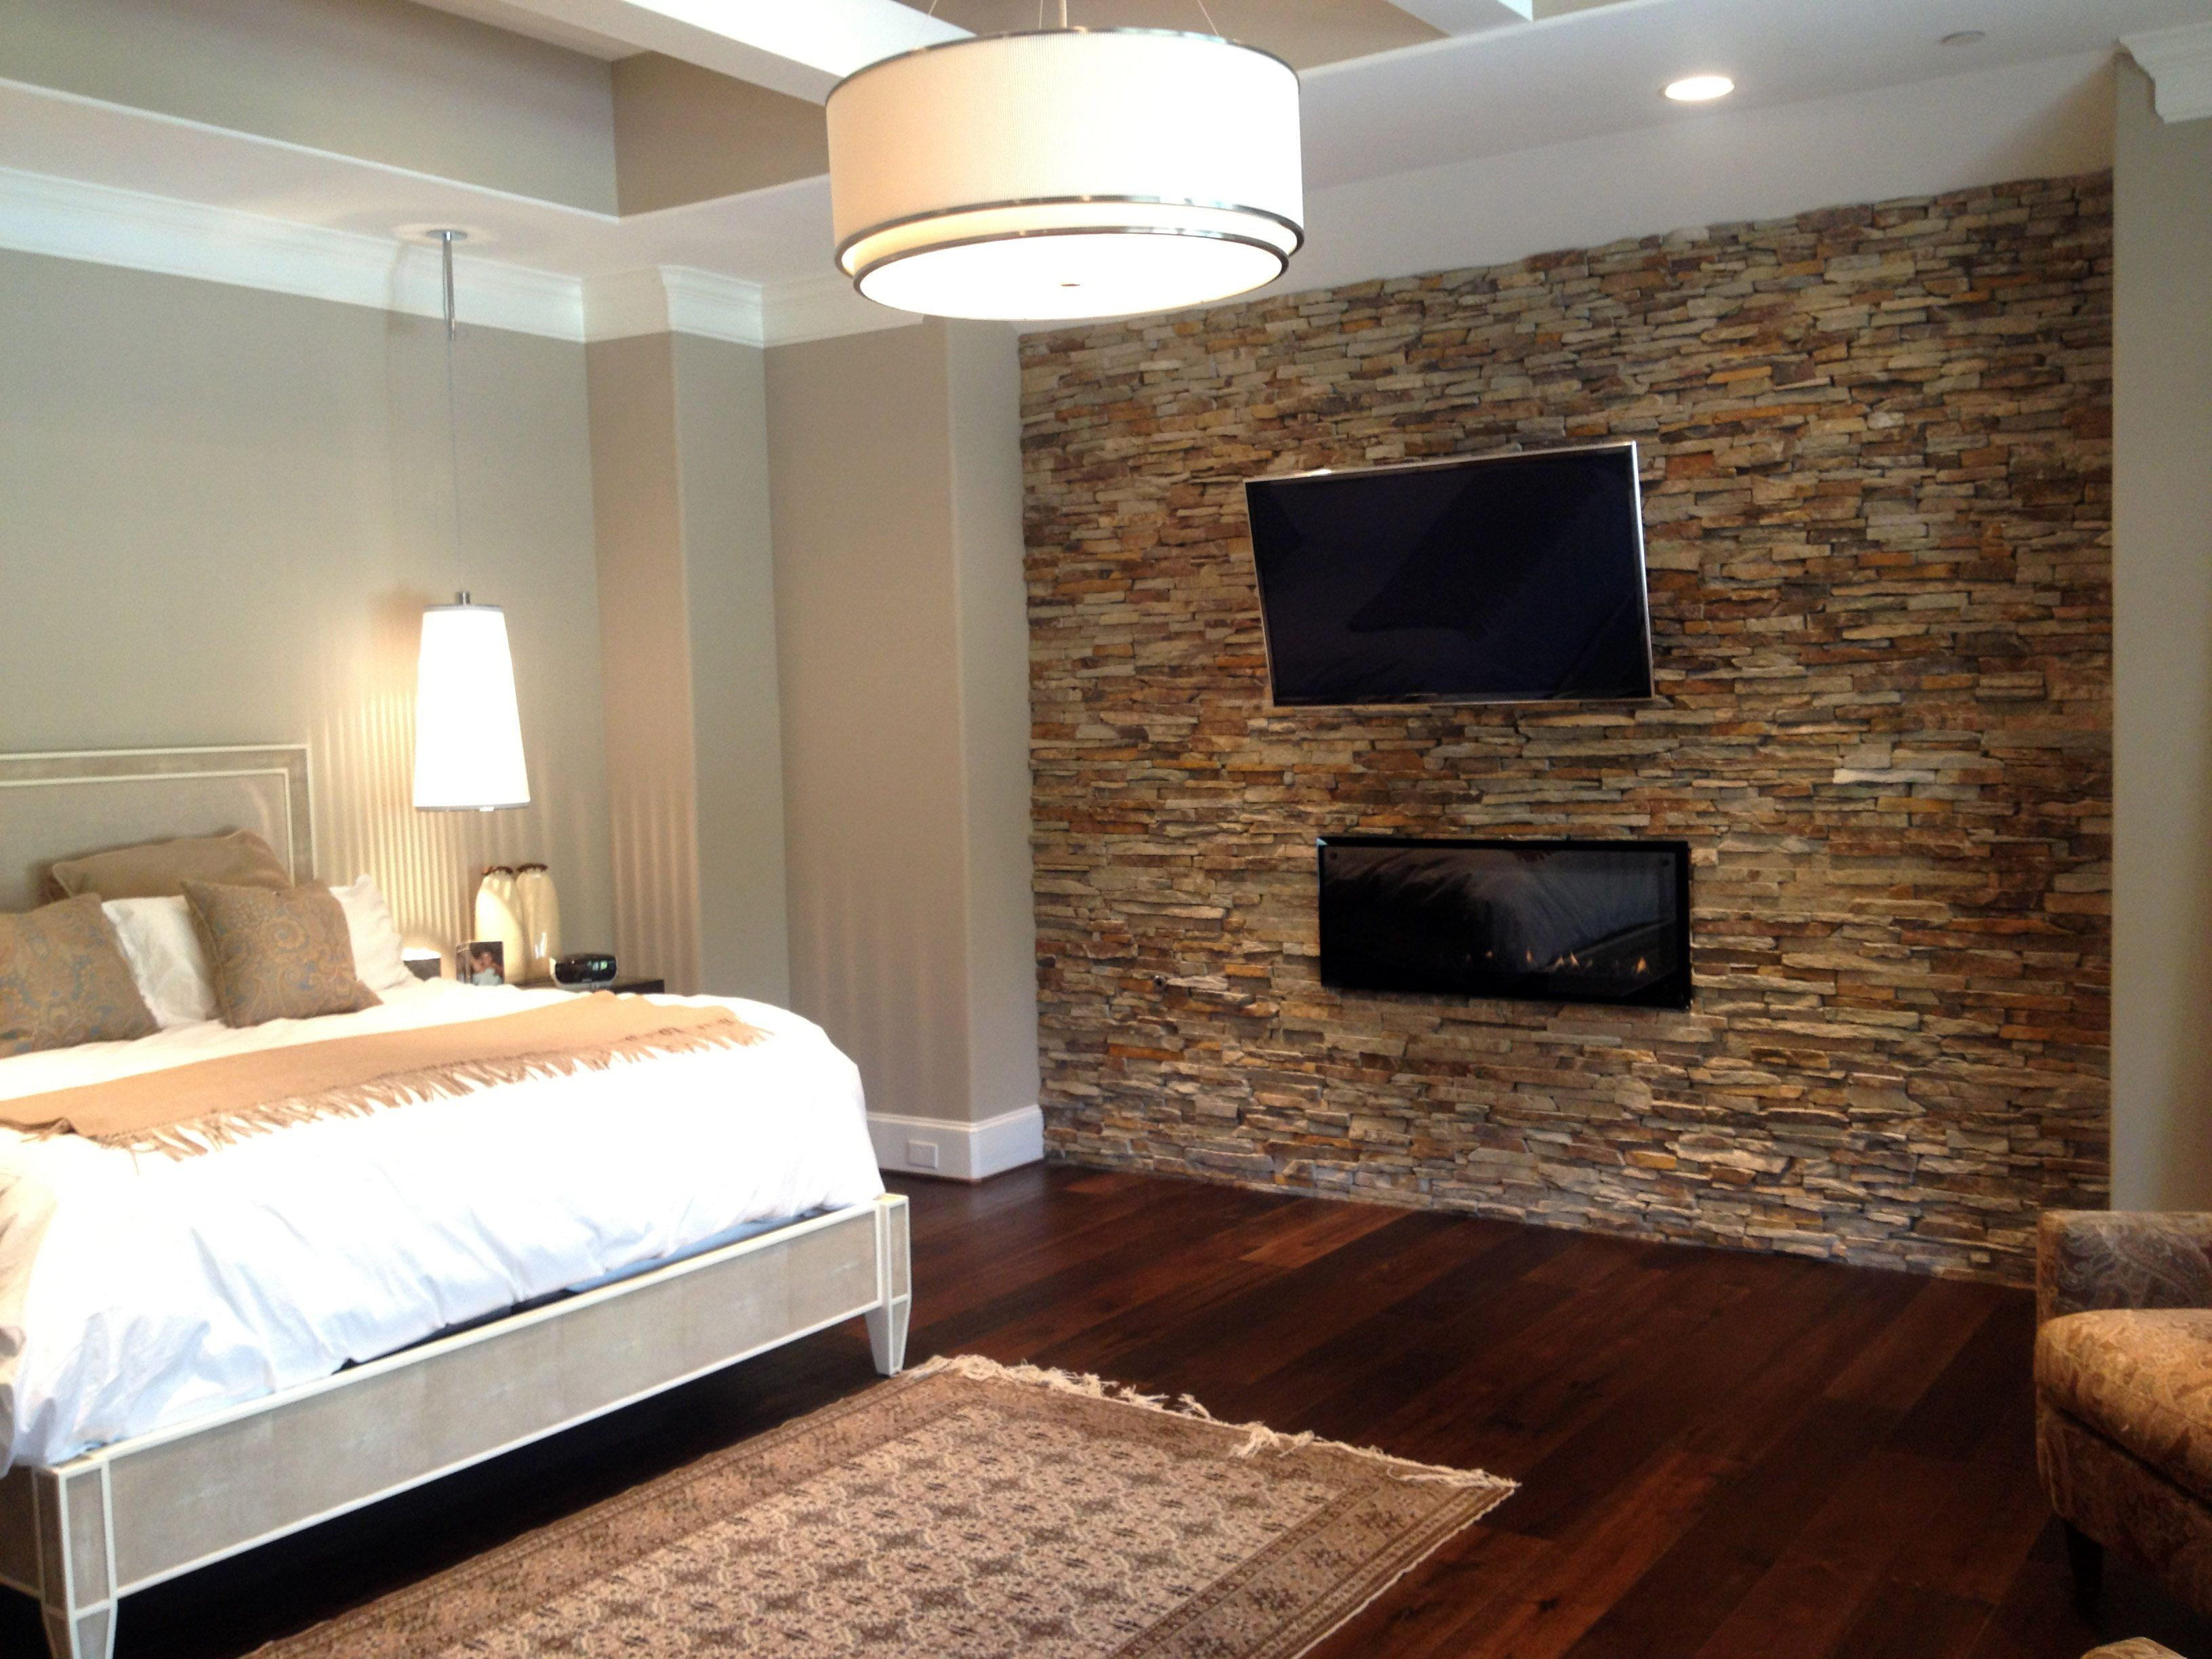 Best Master Bedroom Virginia Ledgestone Accent Walls 400 x 300